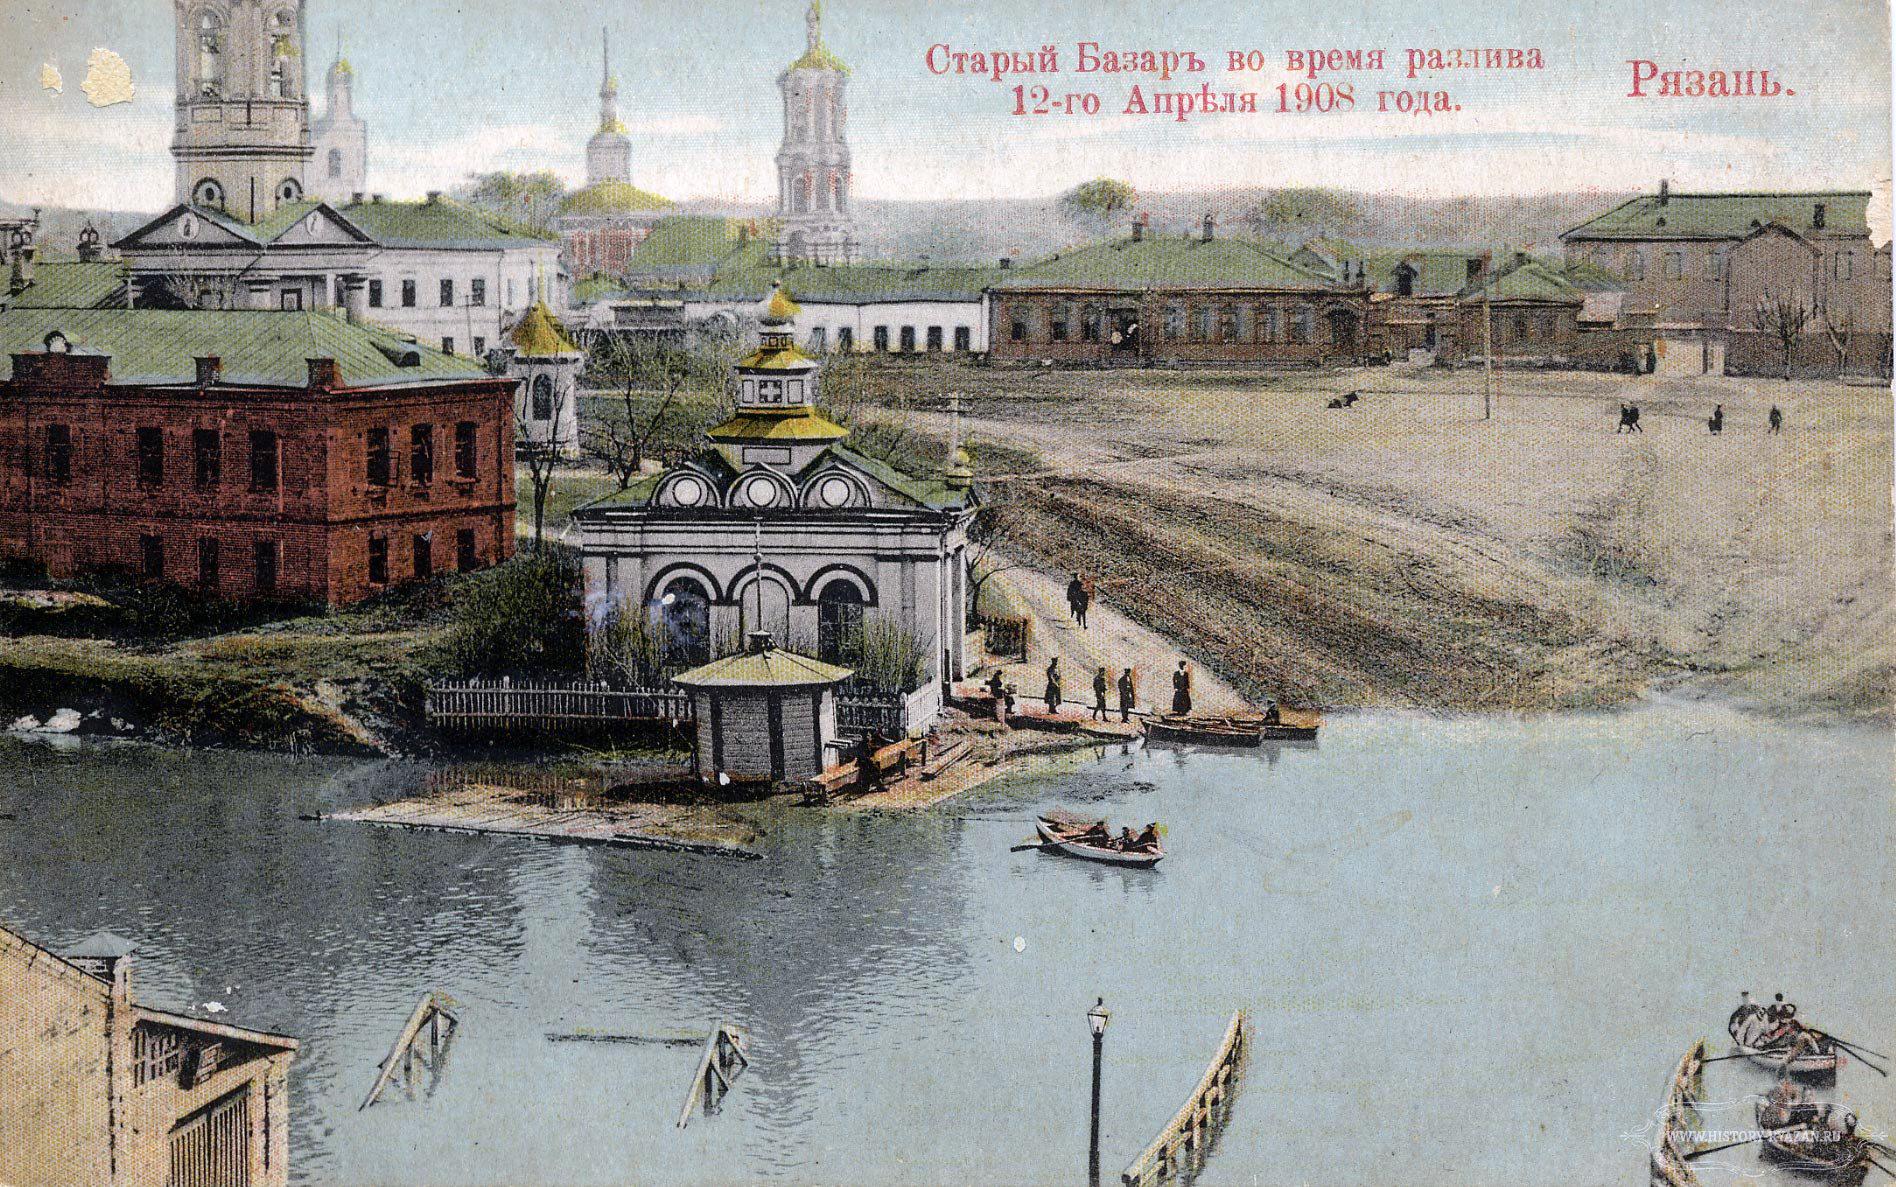 Старый базар во время разлива 12 апреля 1908